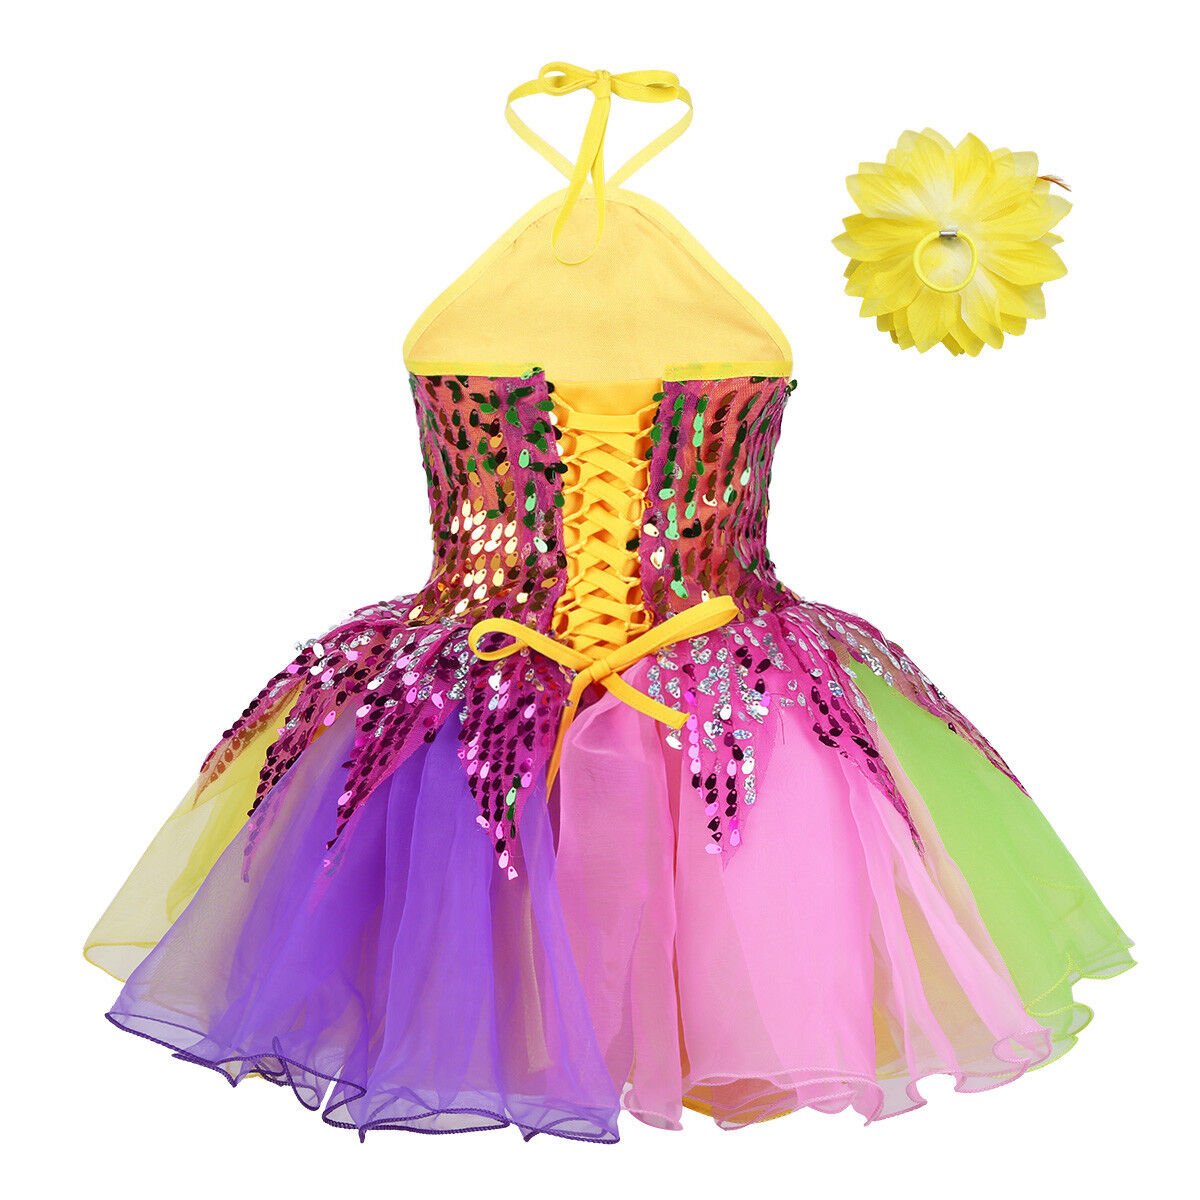 UK Kids Tutu Dress Floral Latin Dance Girls Sequins Costume Jazz Leotard Skirt